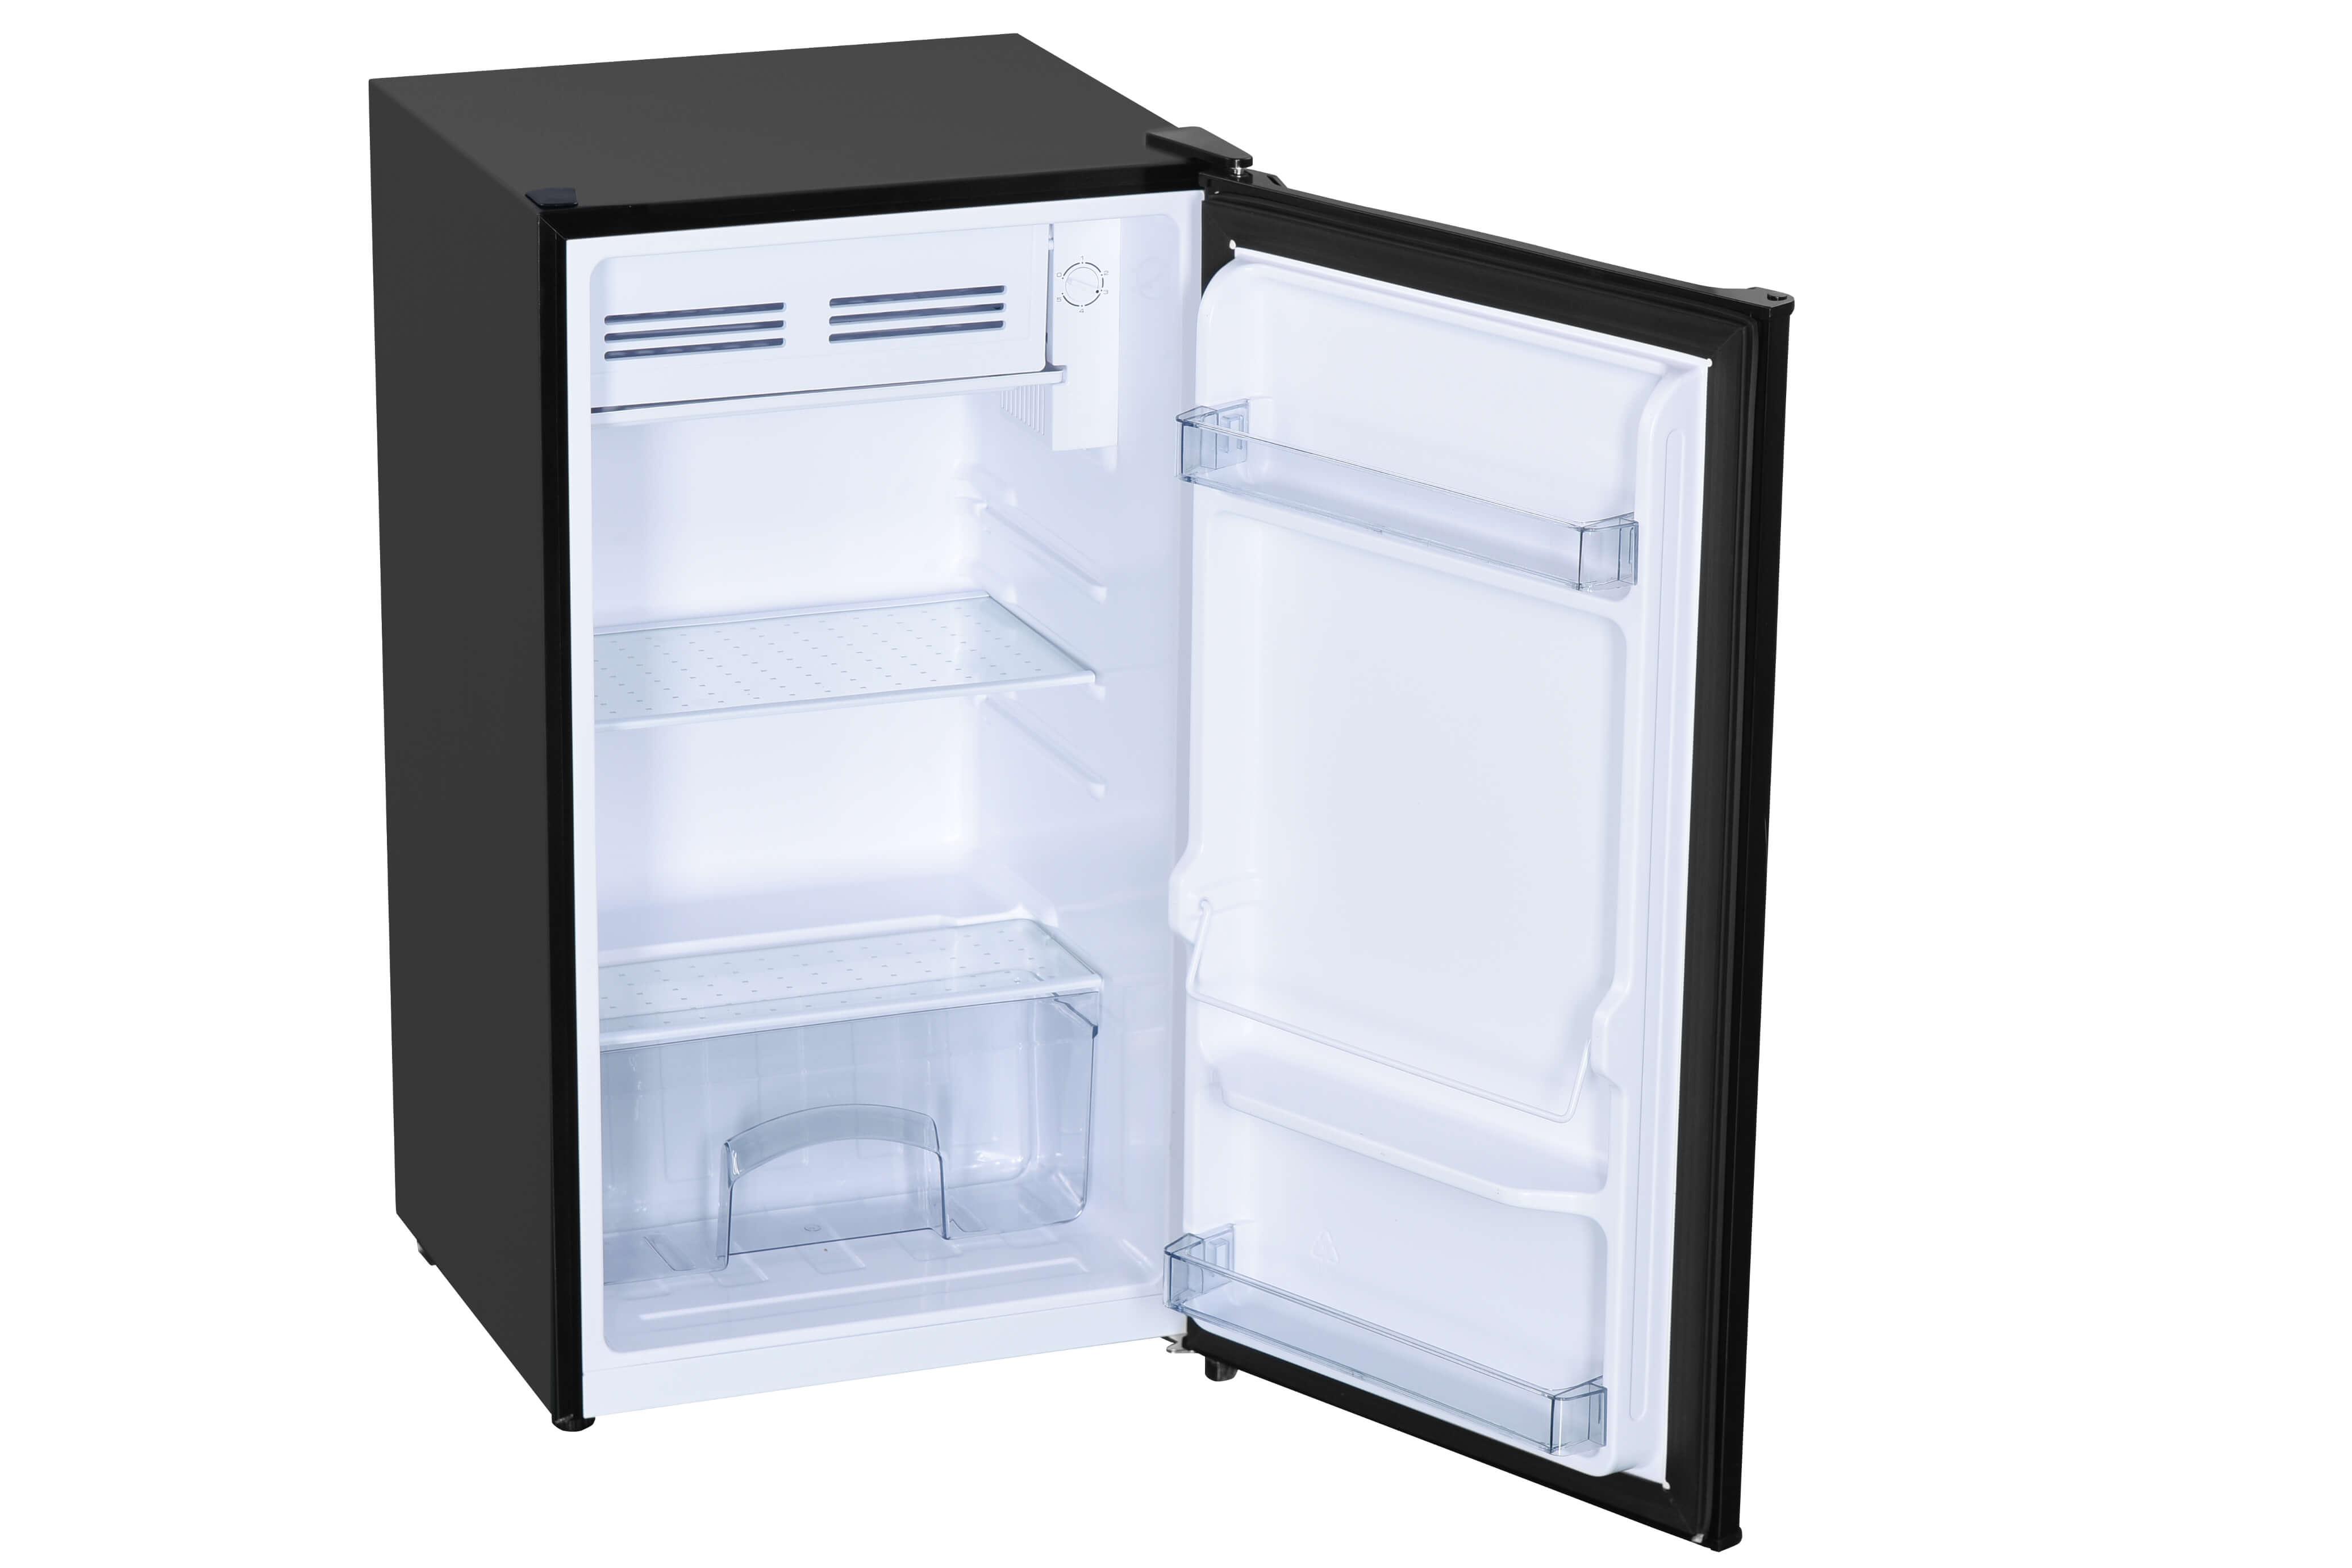 Danby 3.3 cu.ft Compact Refrigerator